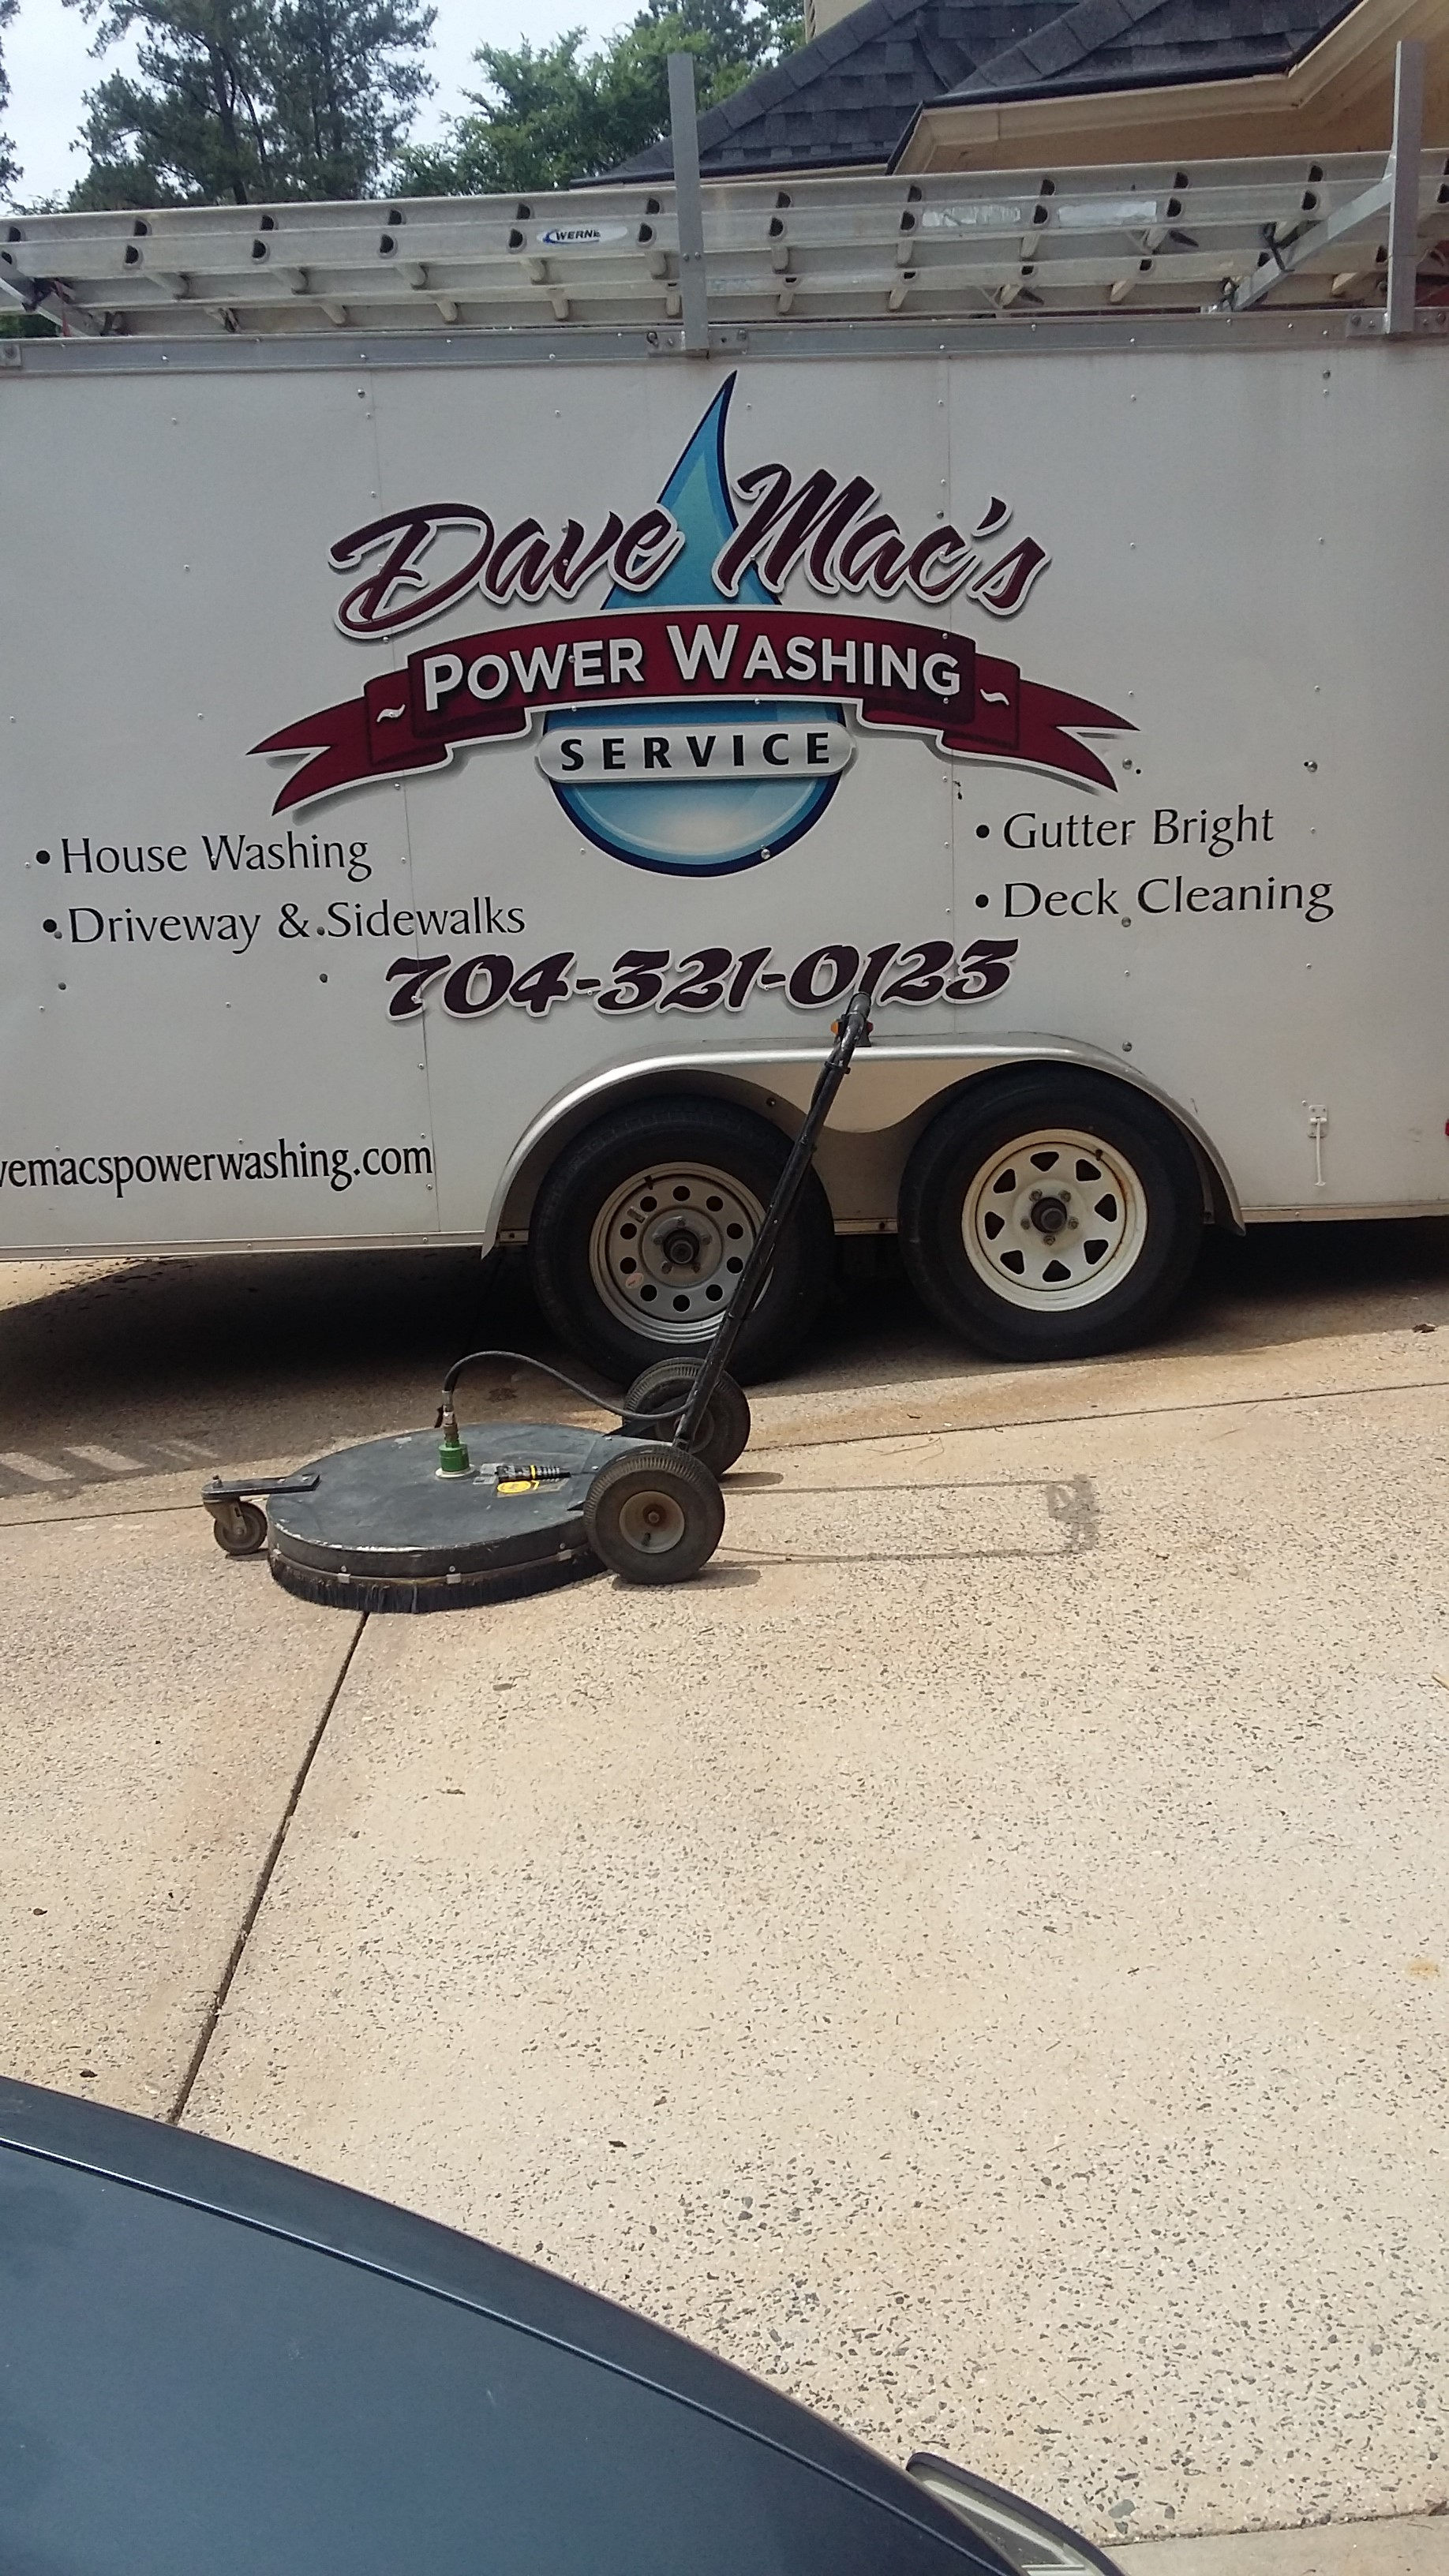 Pressure washing service